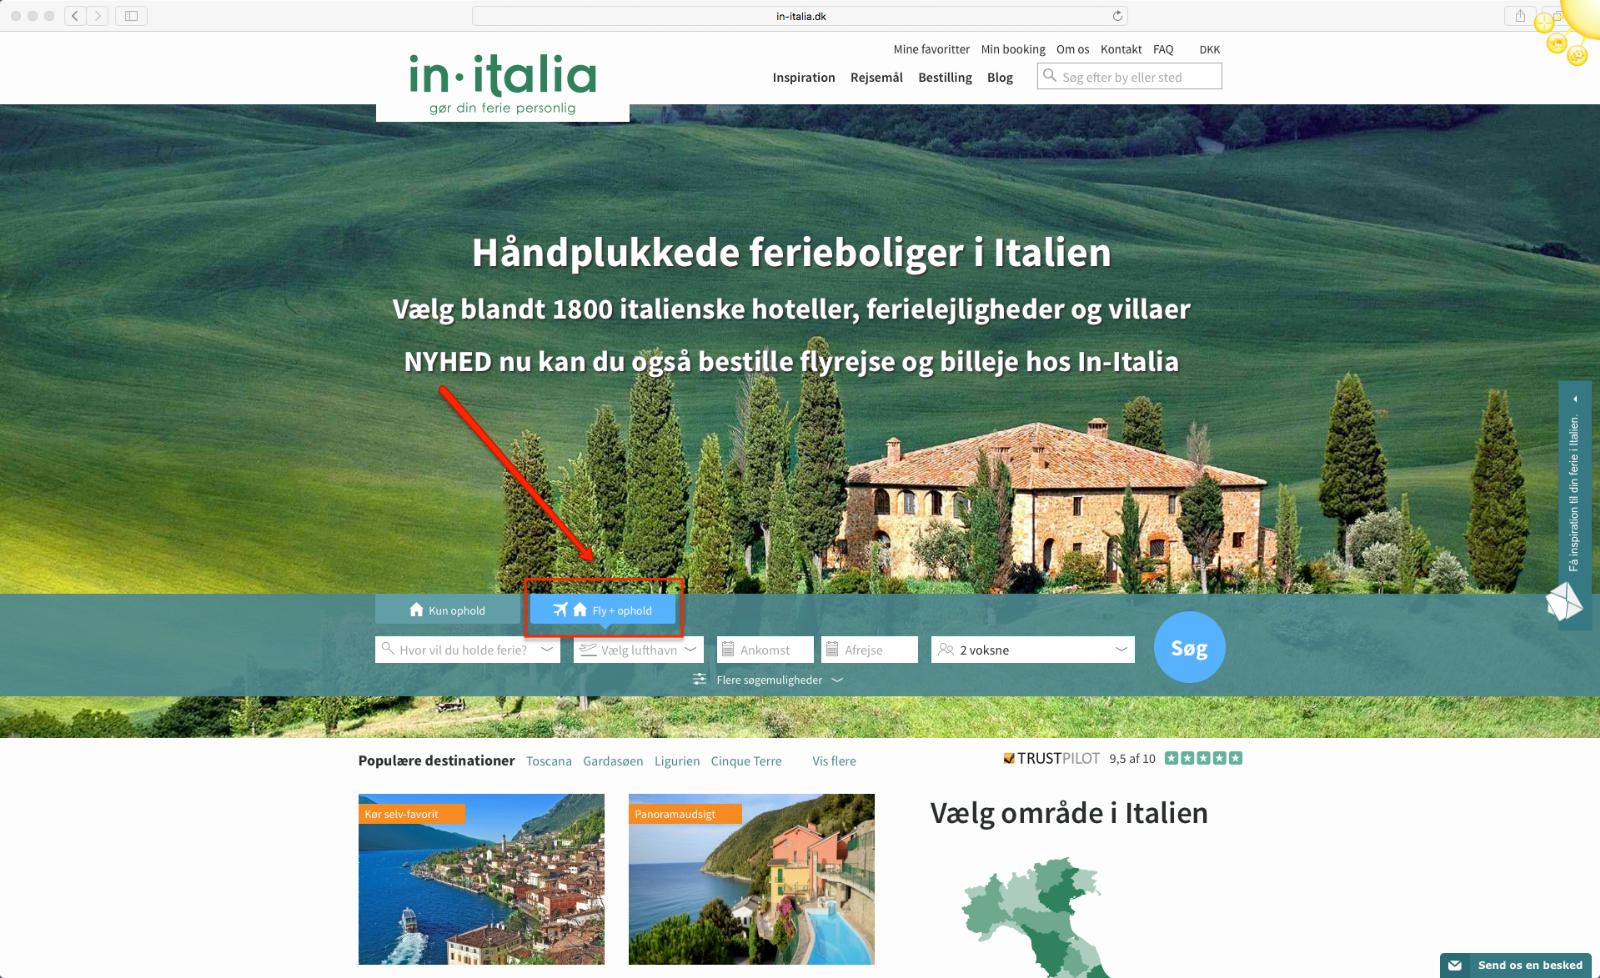 Step 1 saadan bestiller du en pakkerejse med In-Italia Rejser